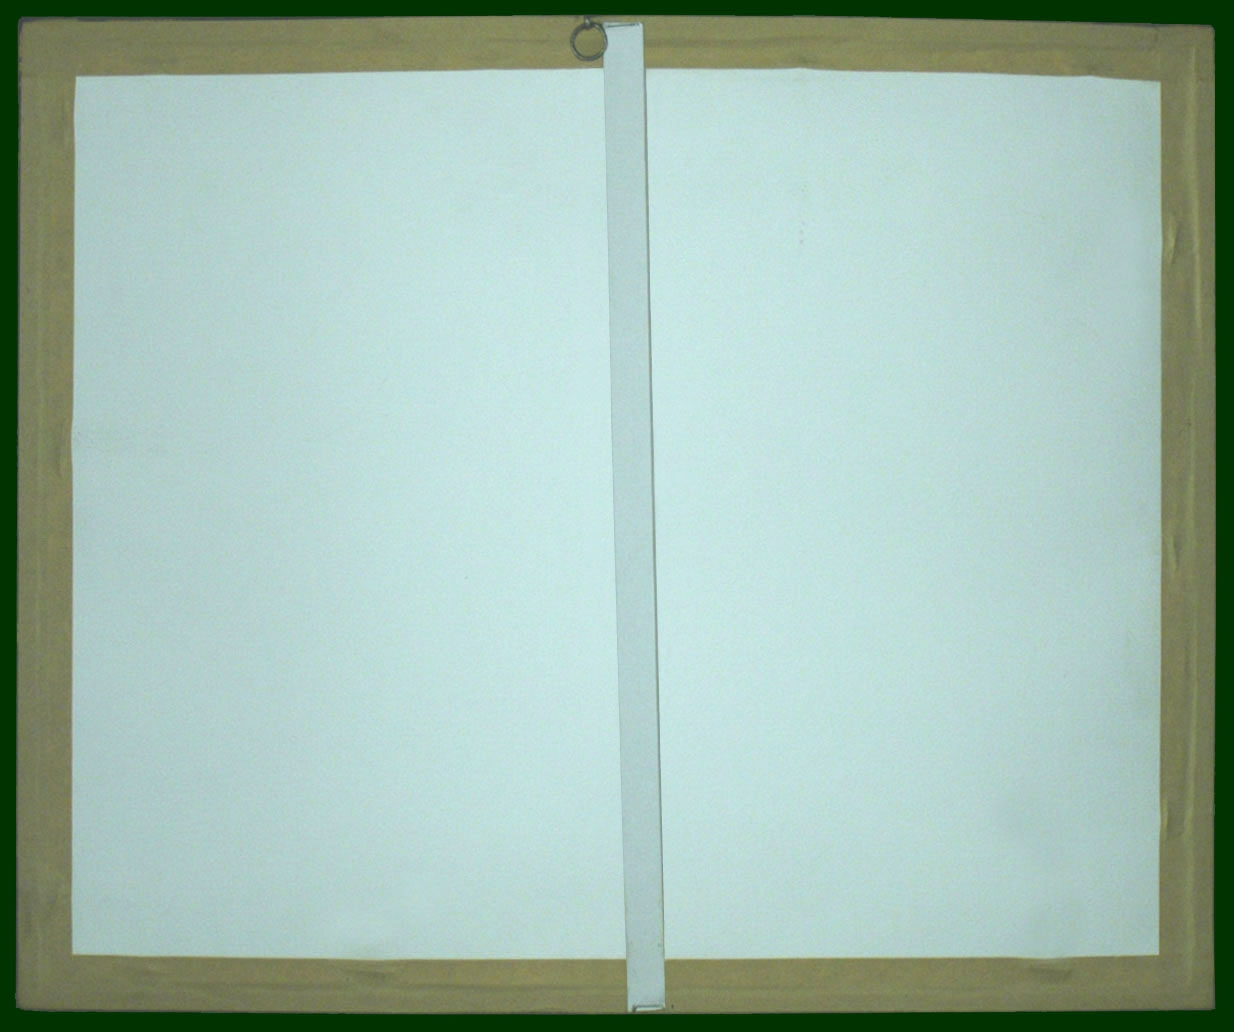 97-29hat buher.jpg (1234×1032)